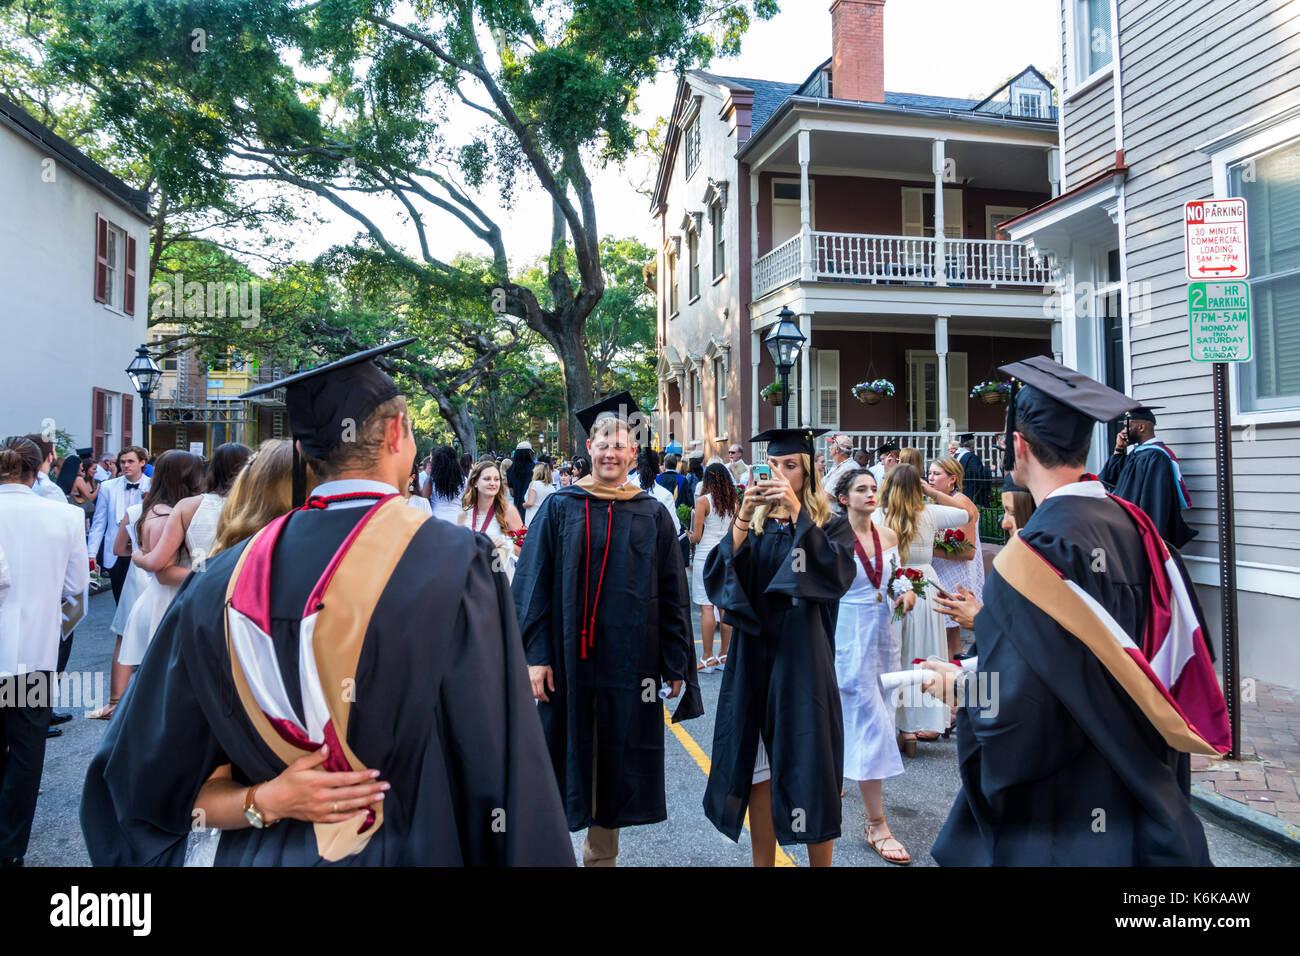 Charleston South Carolina SC College of Charleston university graduation ceremony commencement student crowd posing - Stock Image